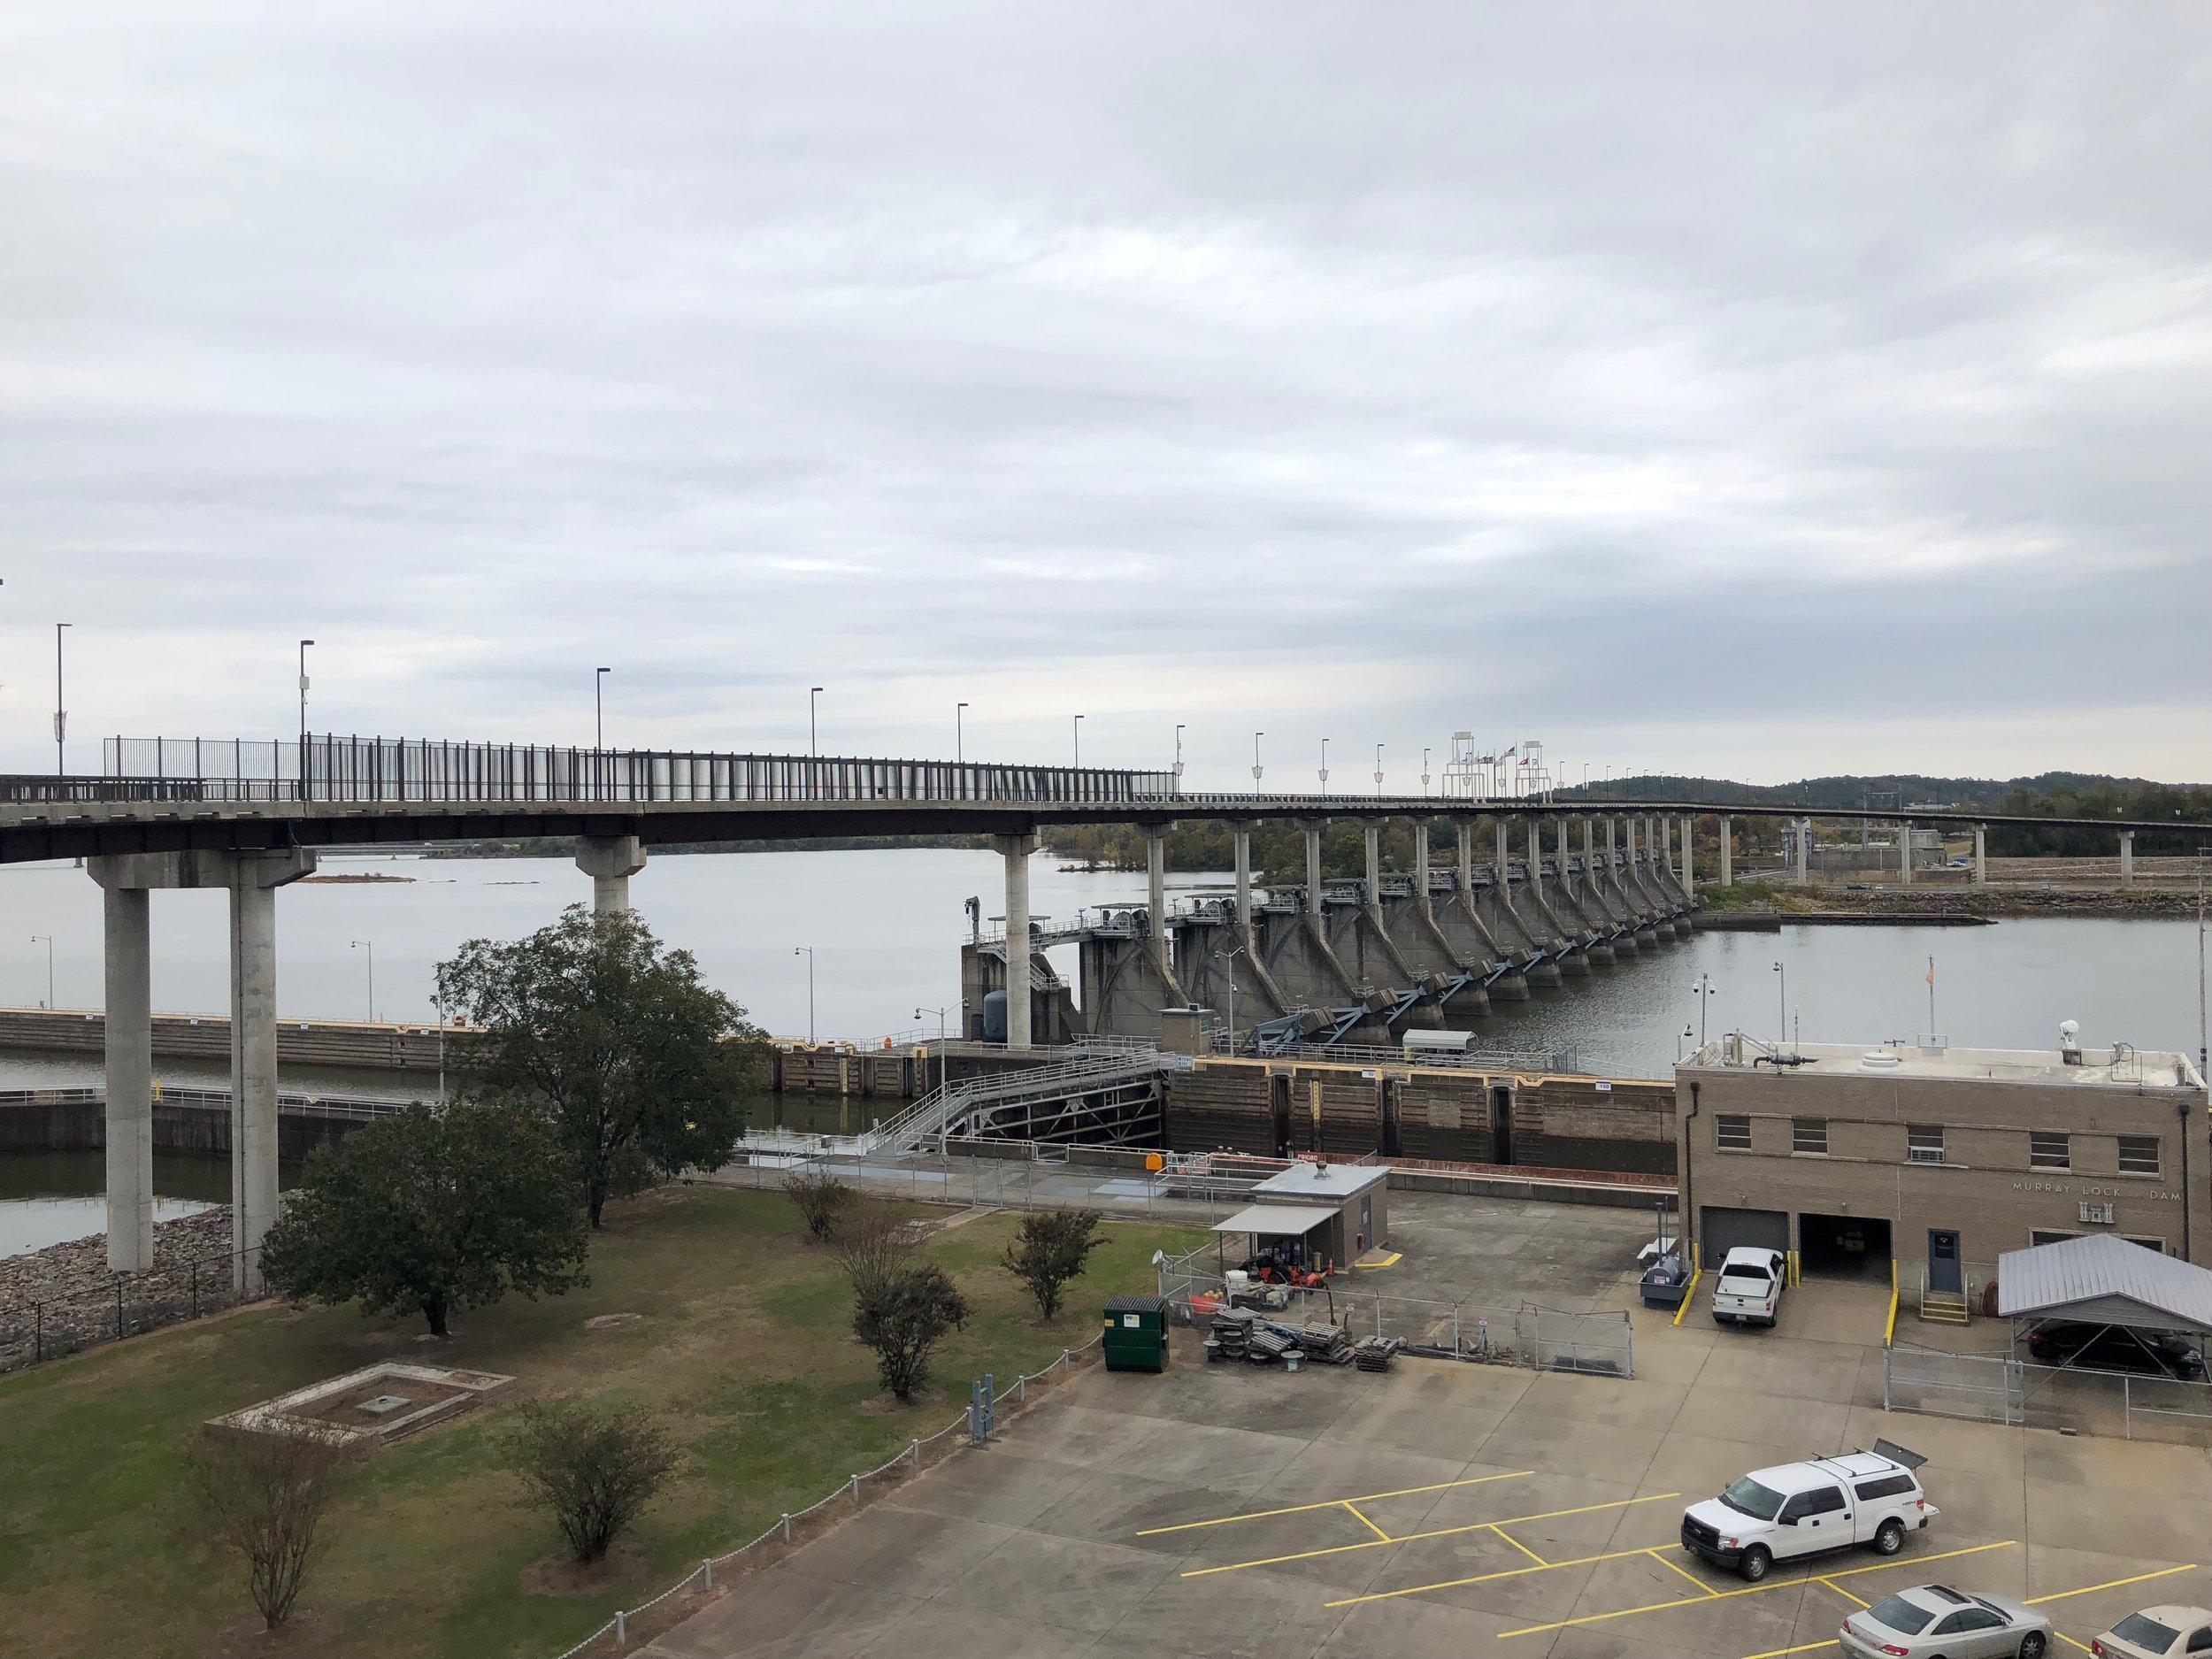 That's a Big Dam Bridge